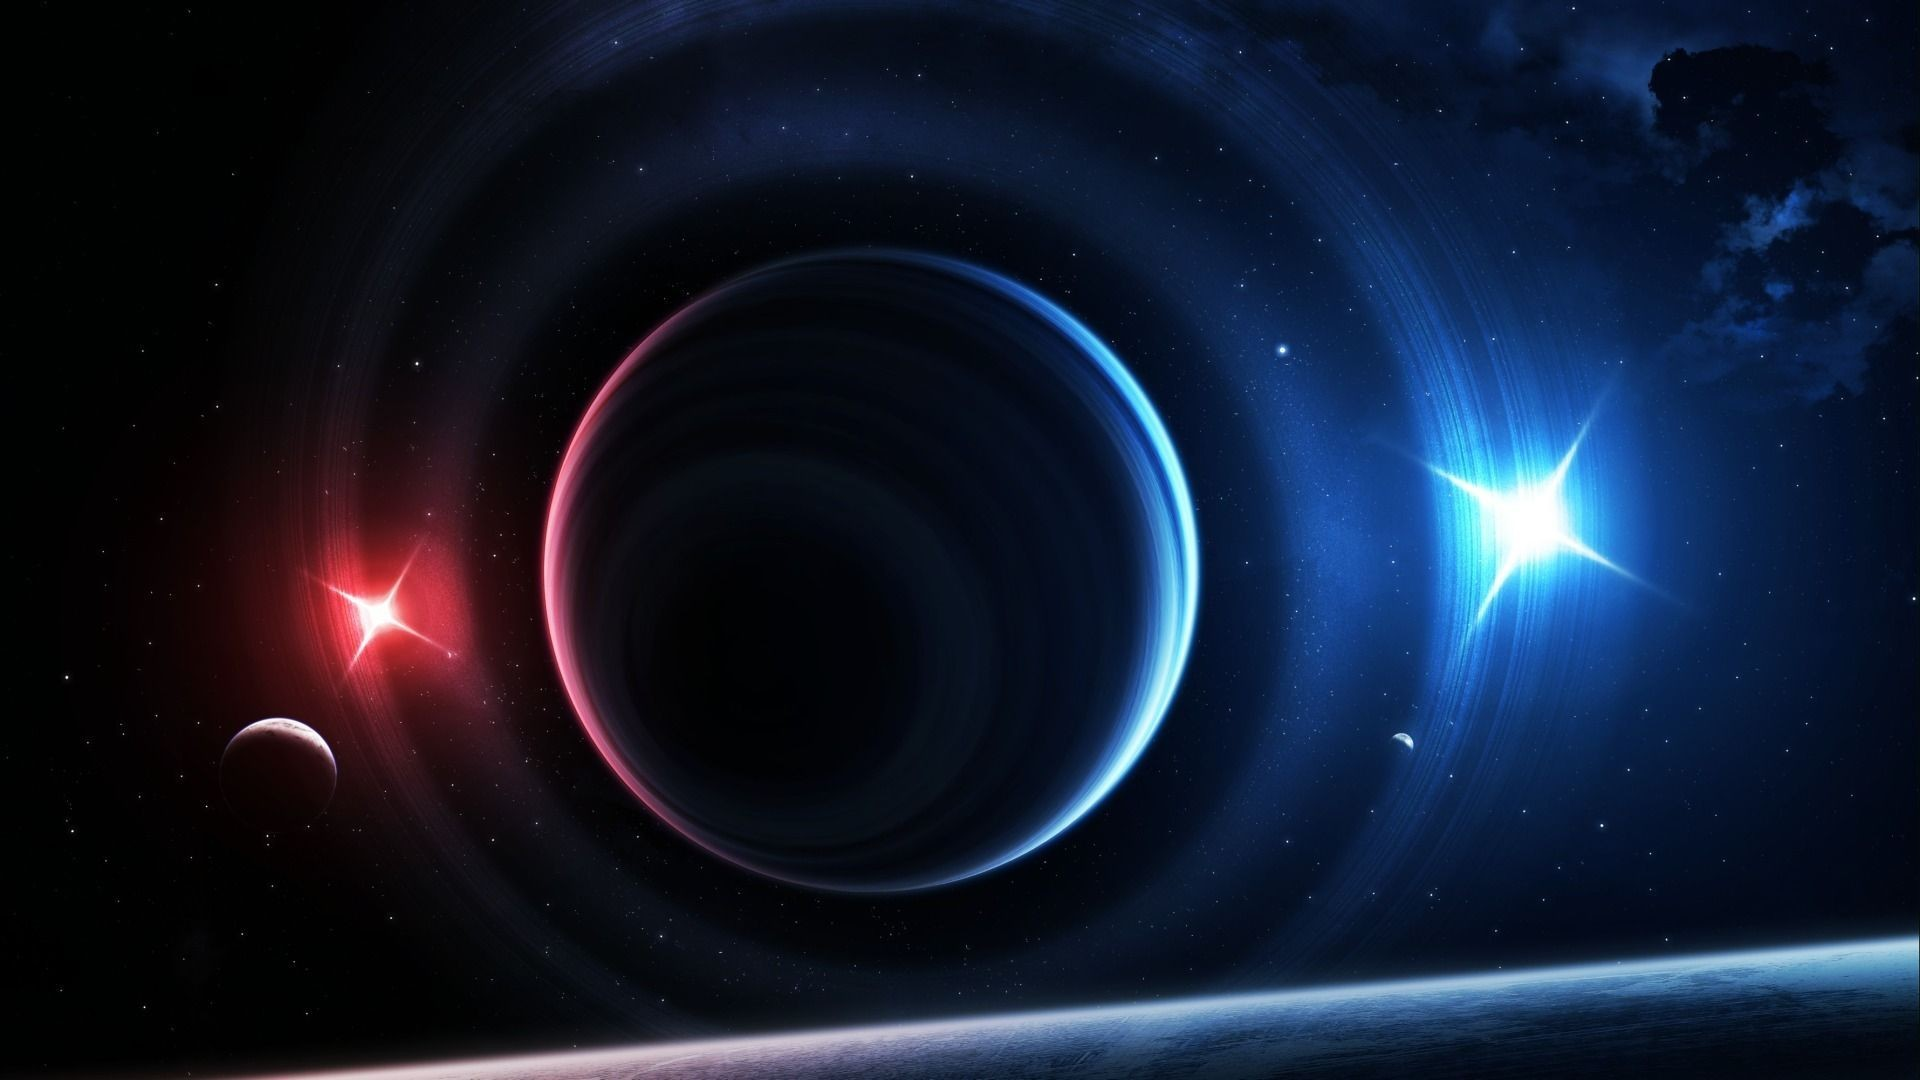 Free download Universe, Galaxy, Planet, Star, Universe, Galaxy Full HD .